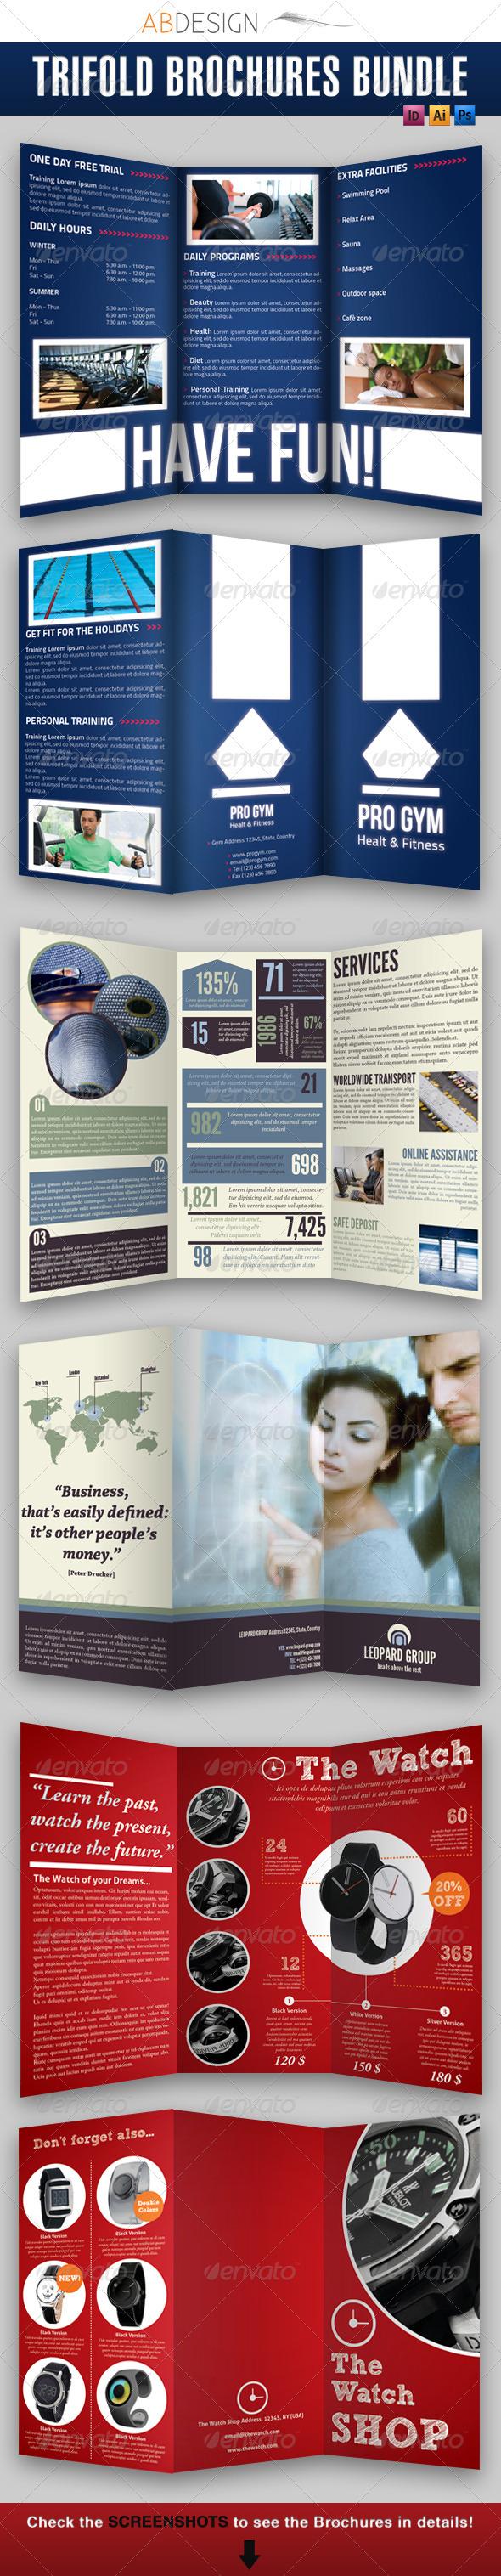 GraphicRiver Trifold Brochures Bundle 2 1392525